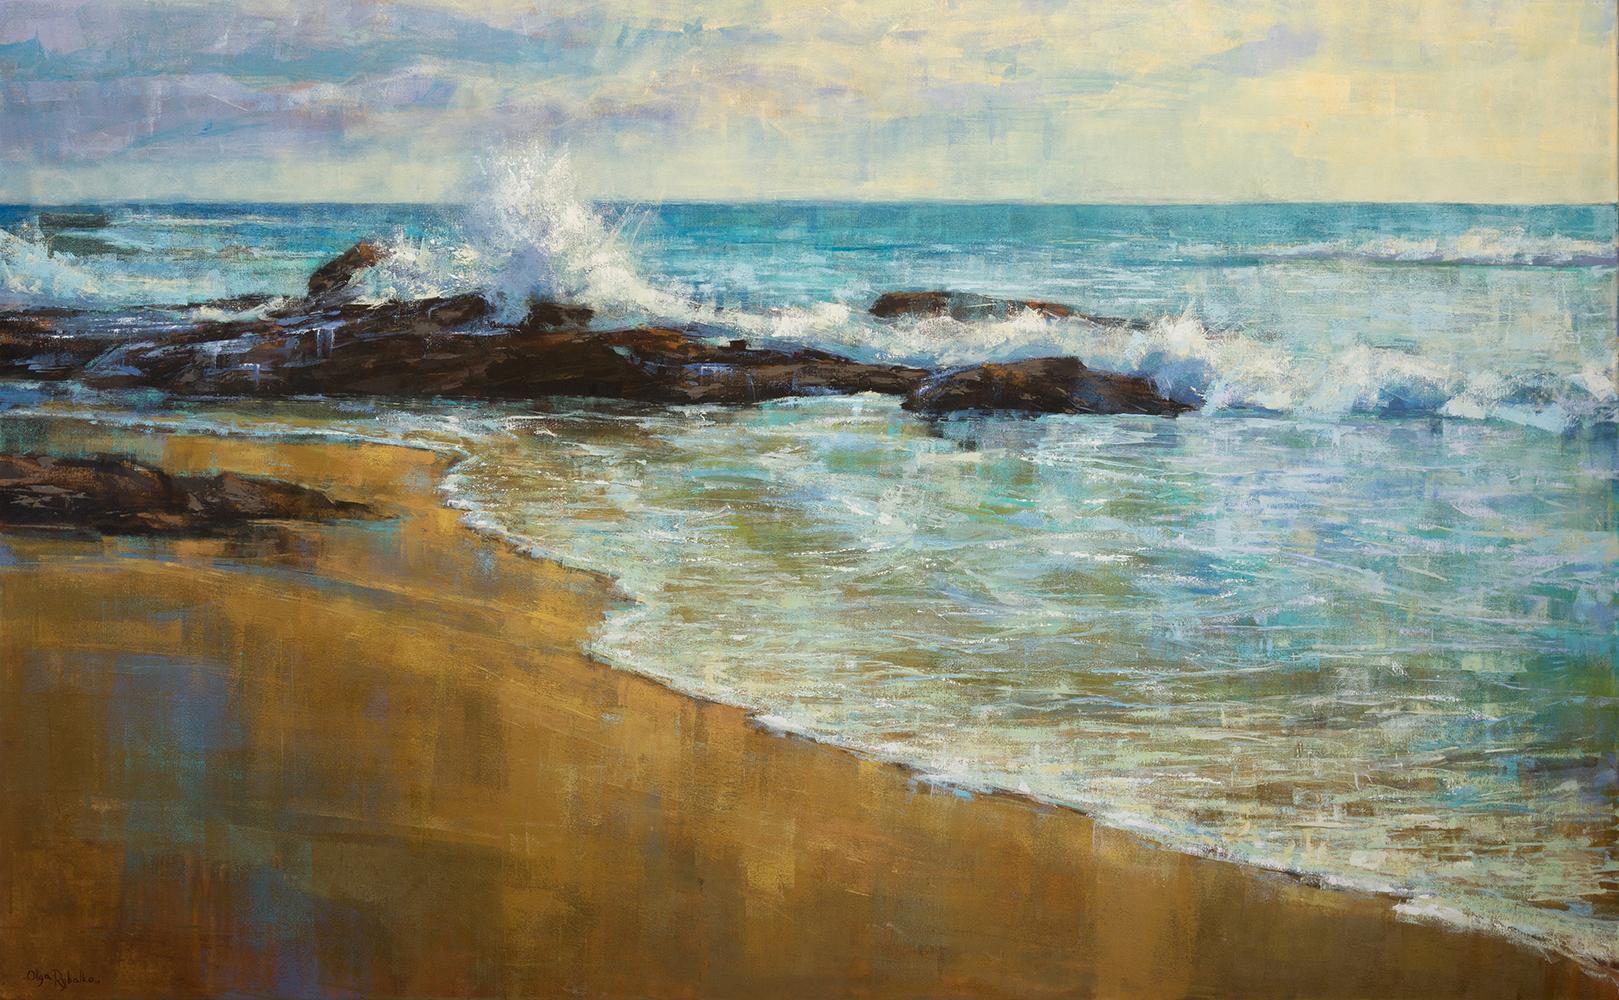 olga rybalko art - pacific rim - sage wave - landscape painting-1.jpg